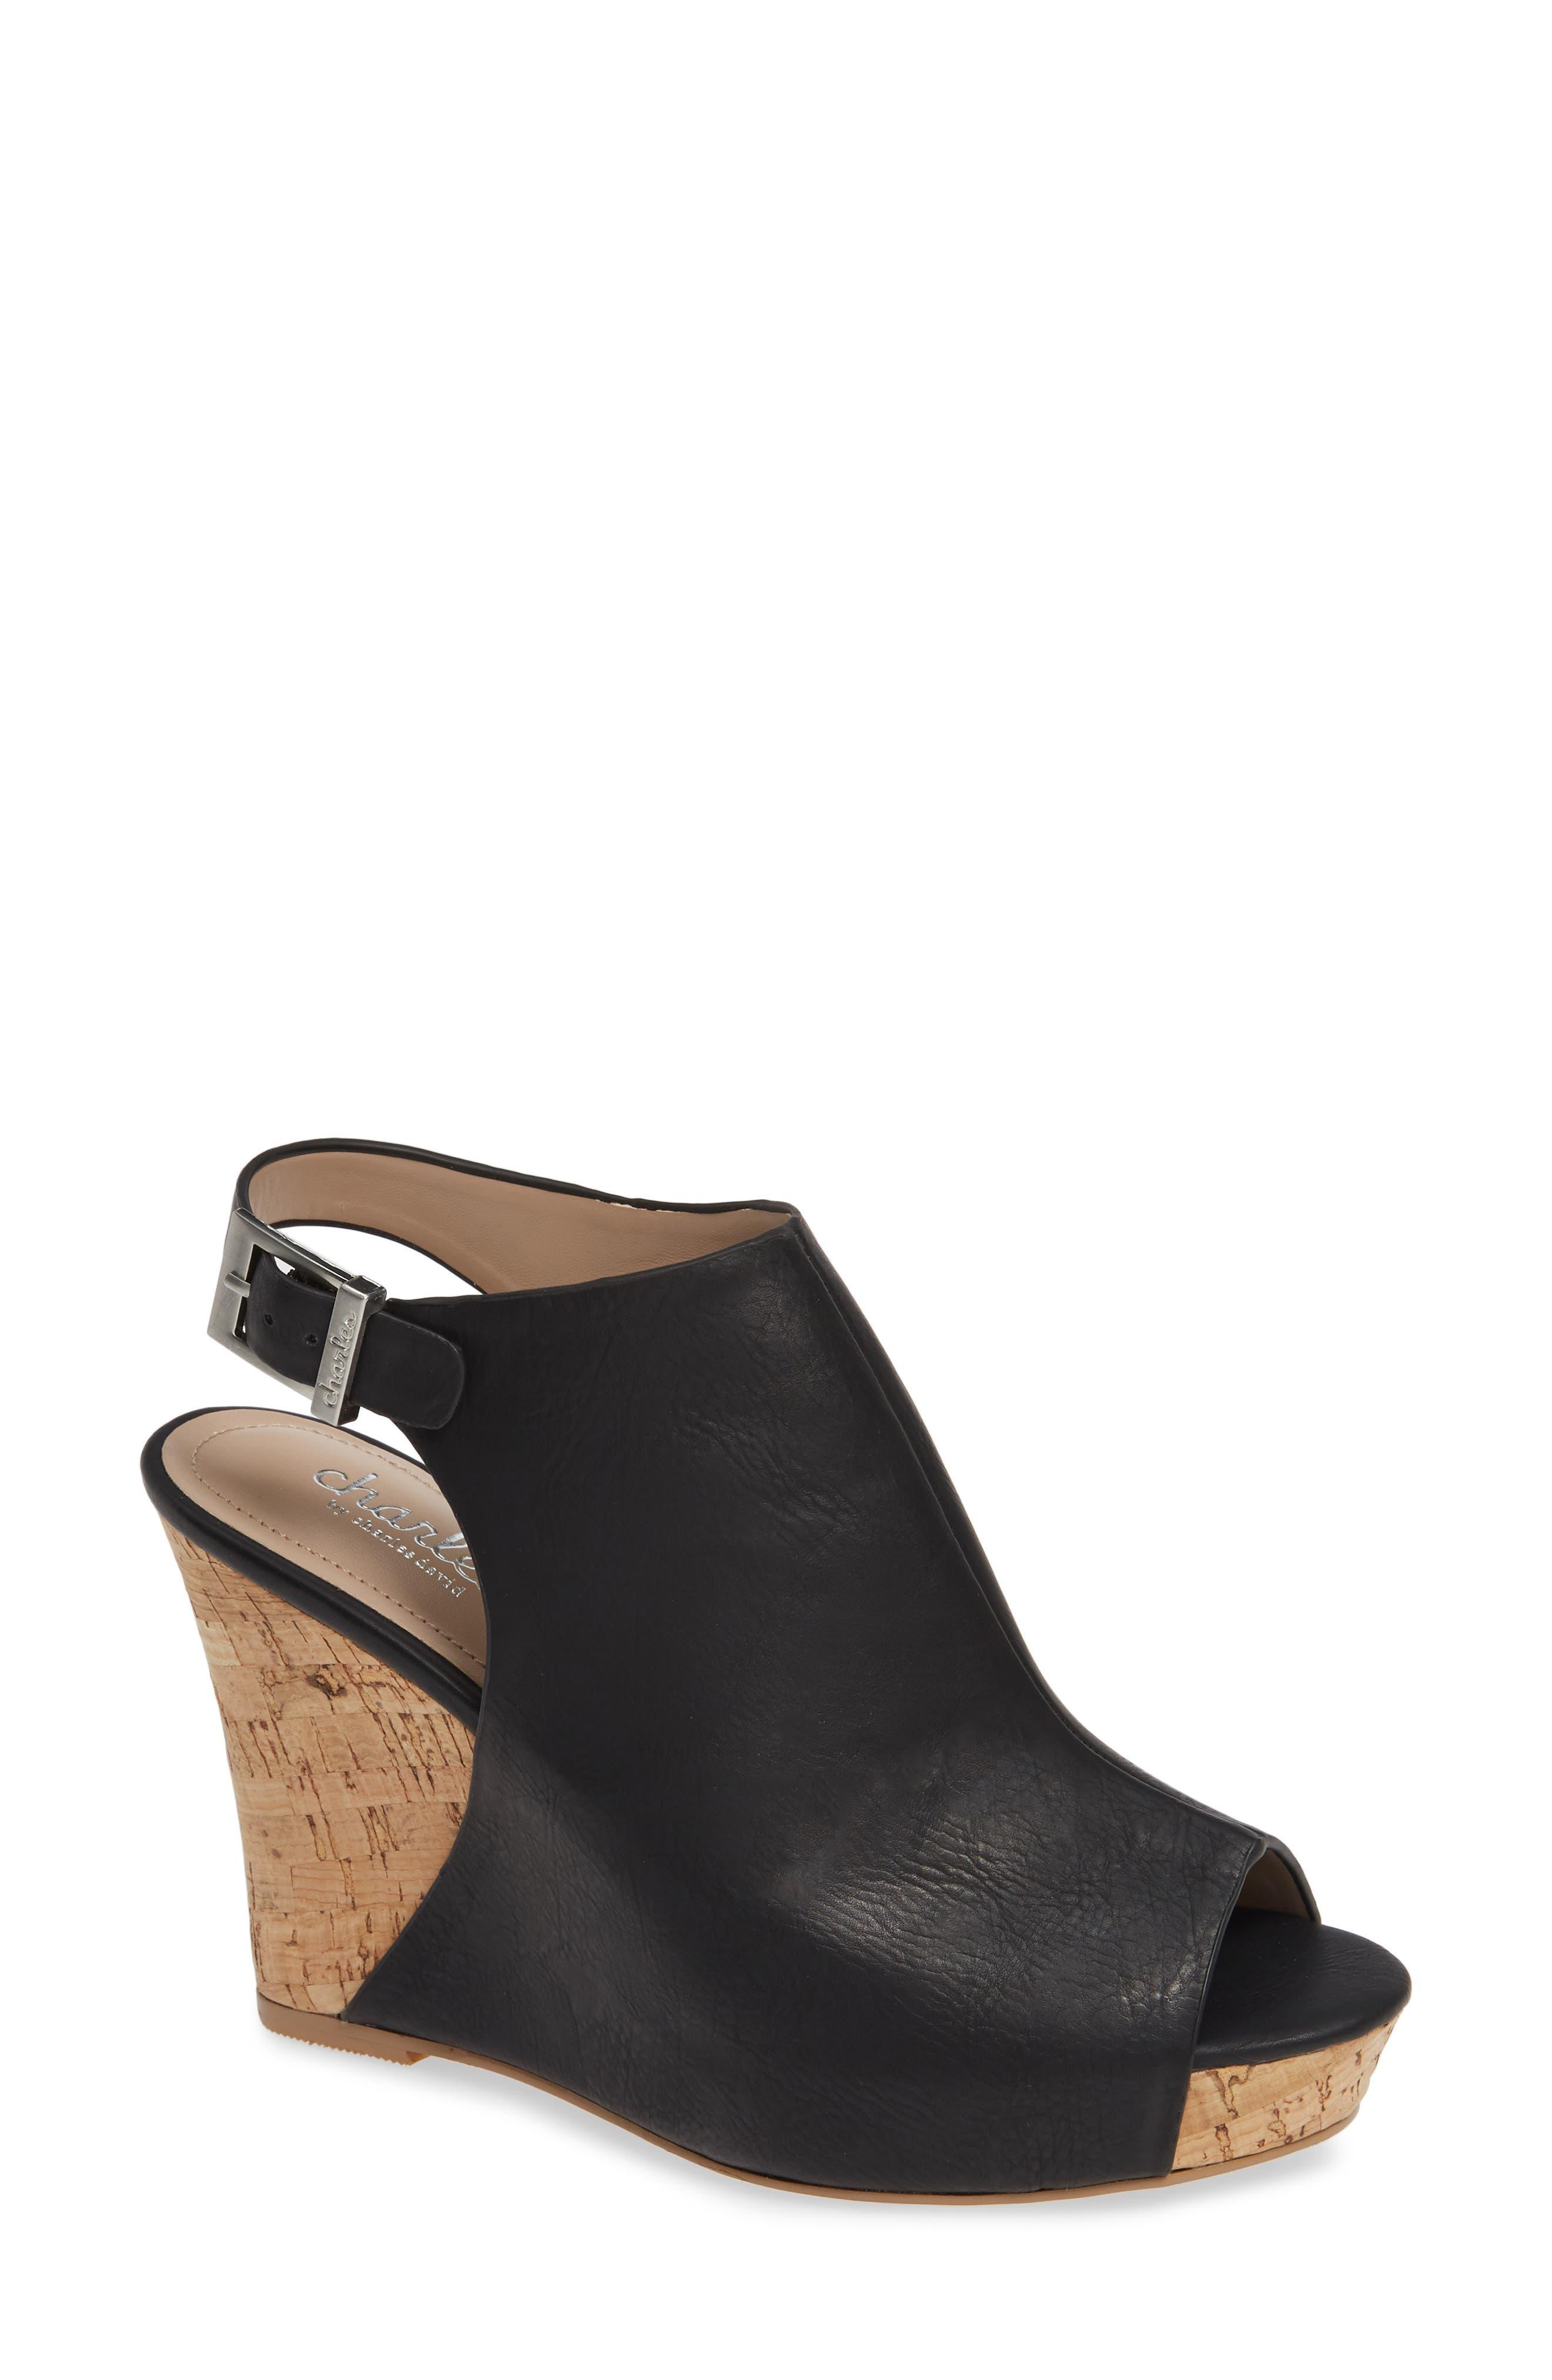 Lobby Slingback Wedge Sandal, Main, color, BLACK FAUX LEATHER